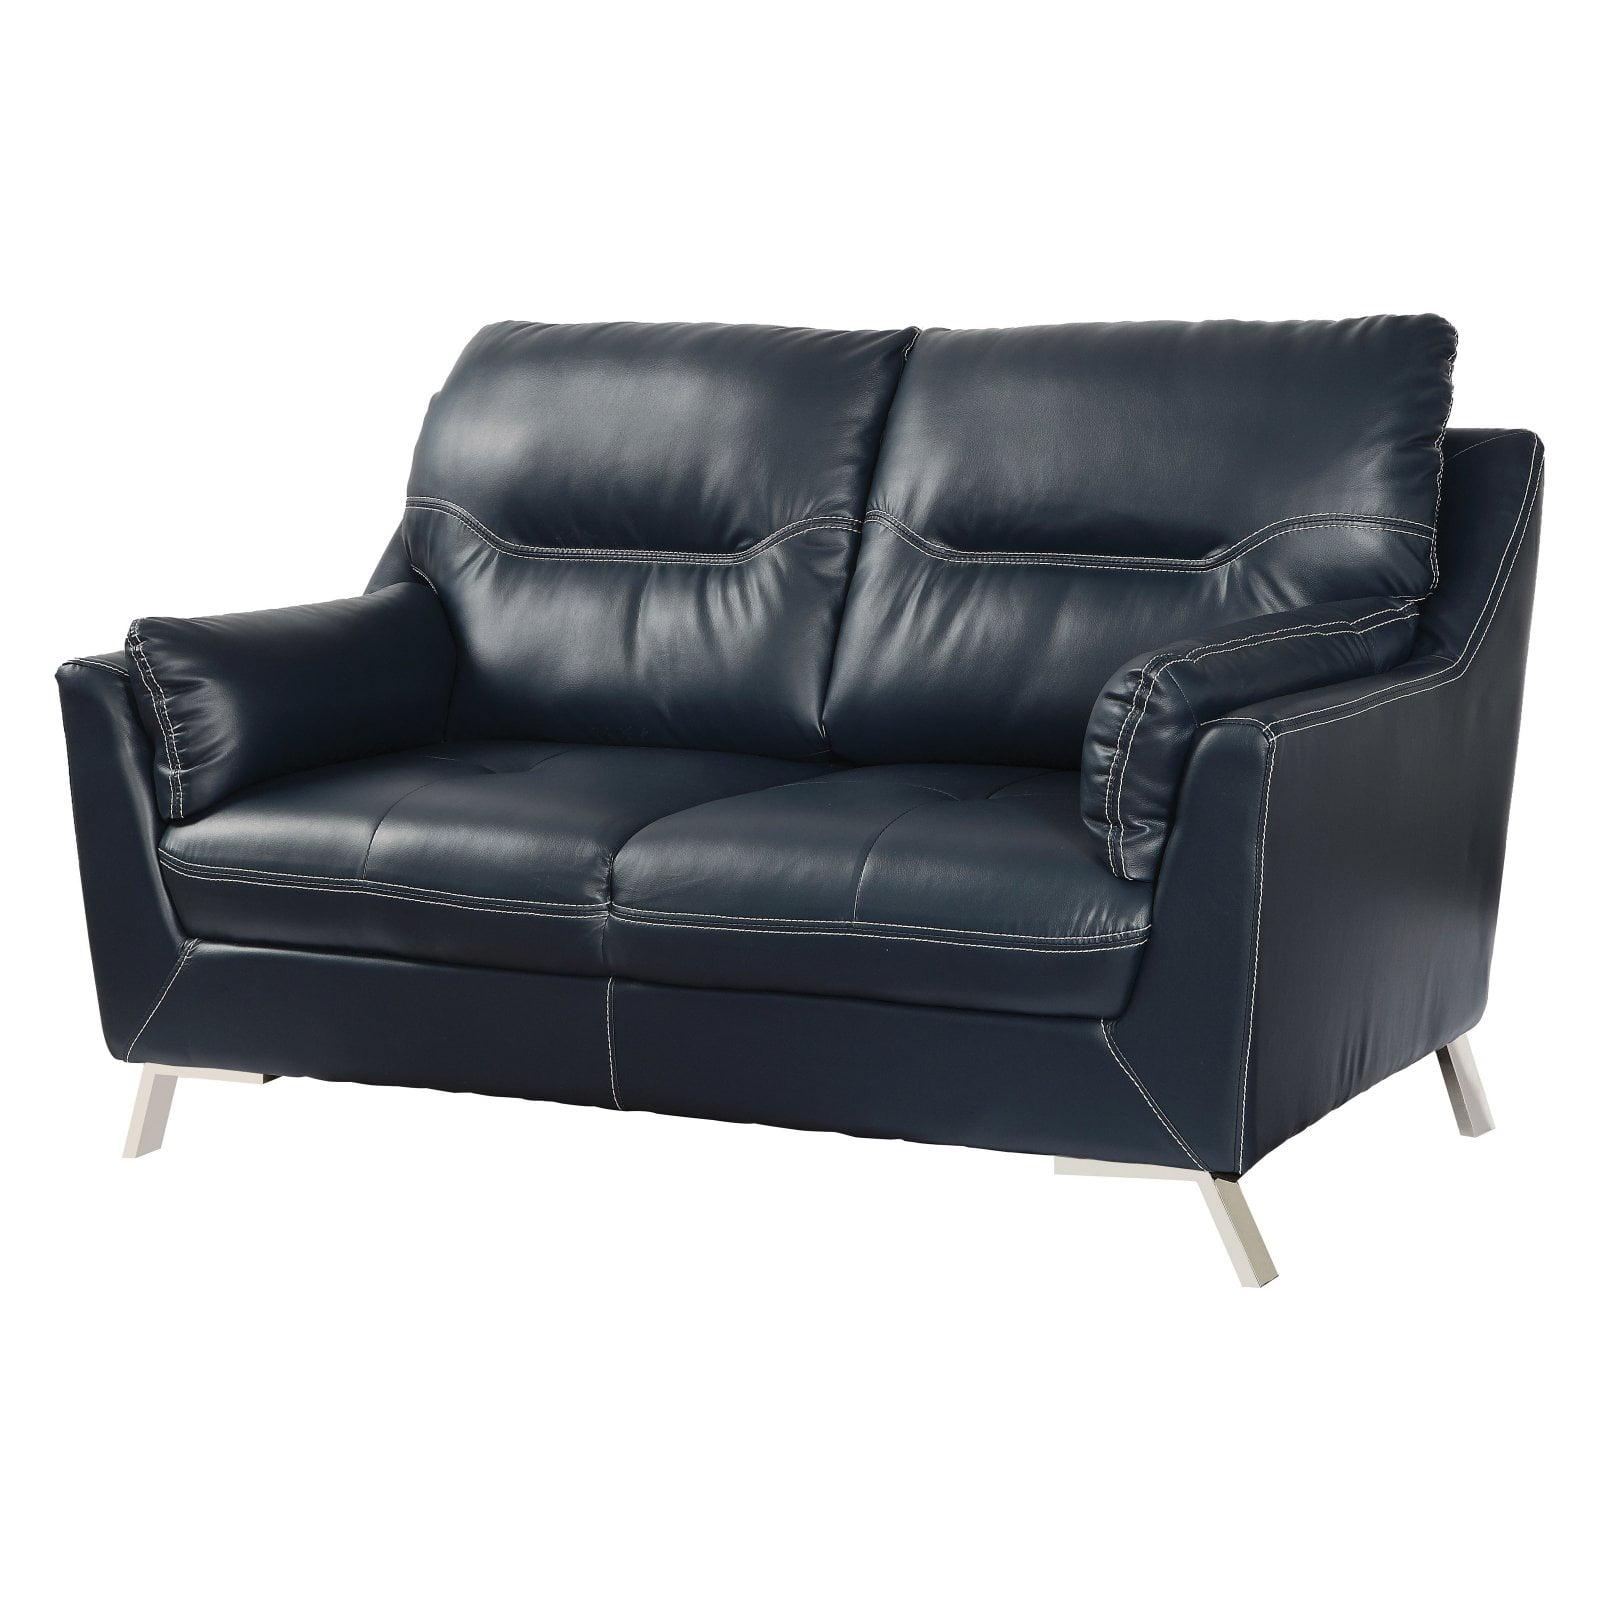 Furniture of America Duryea Love Seat